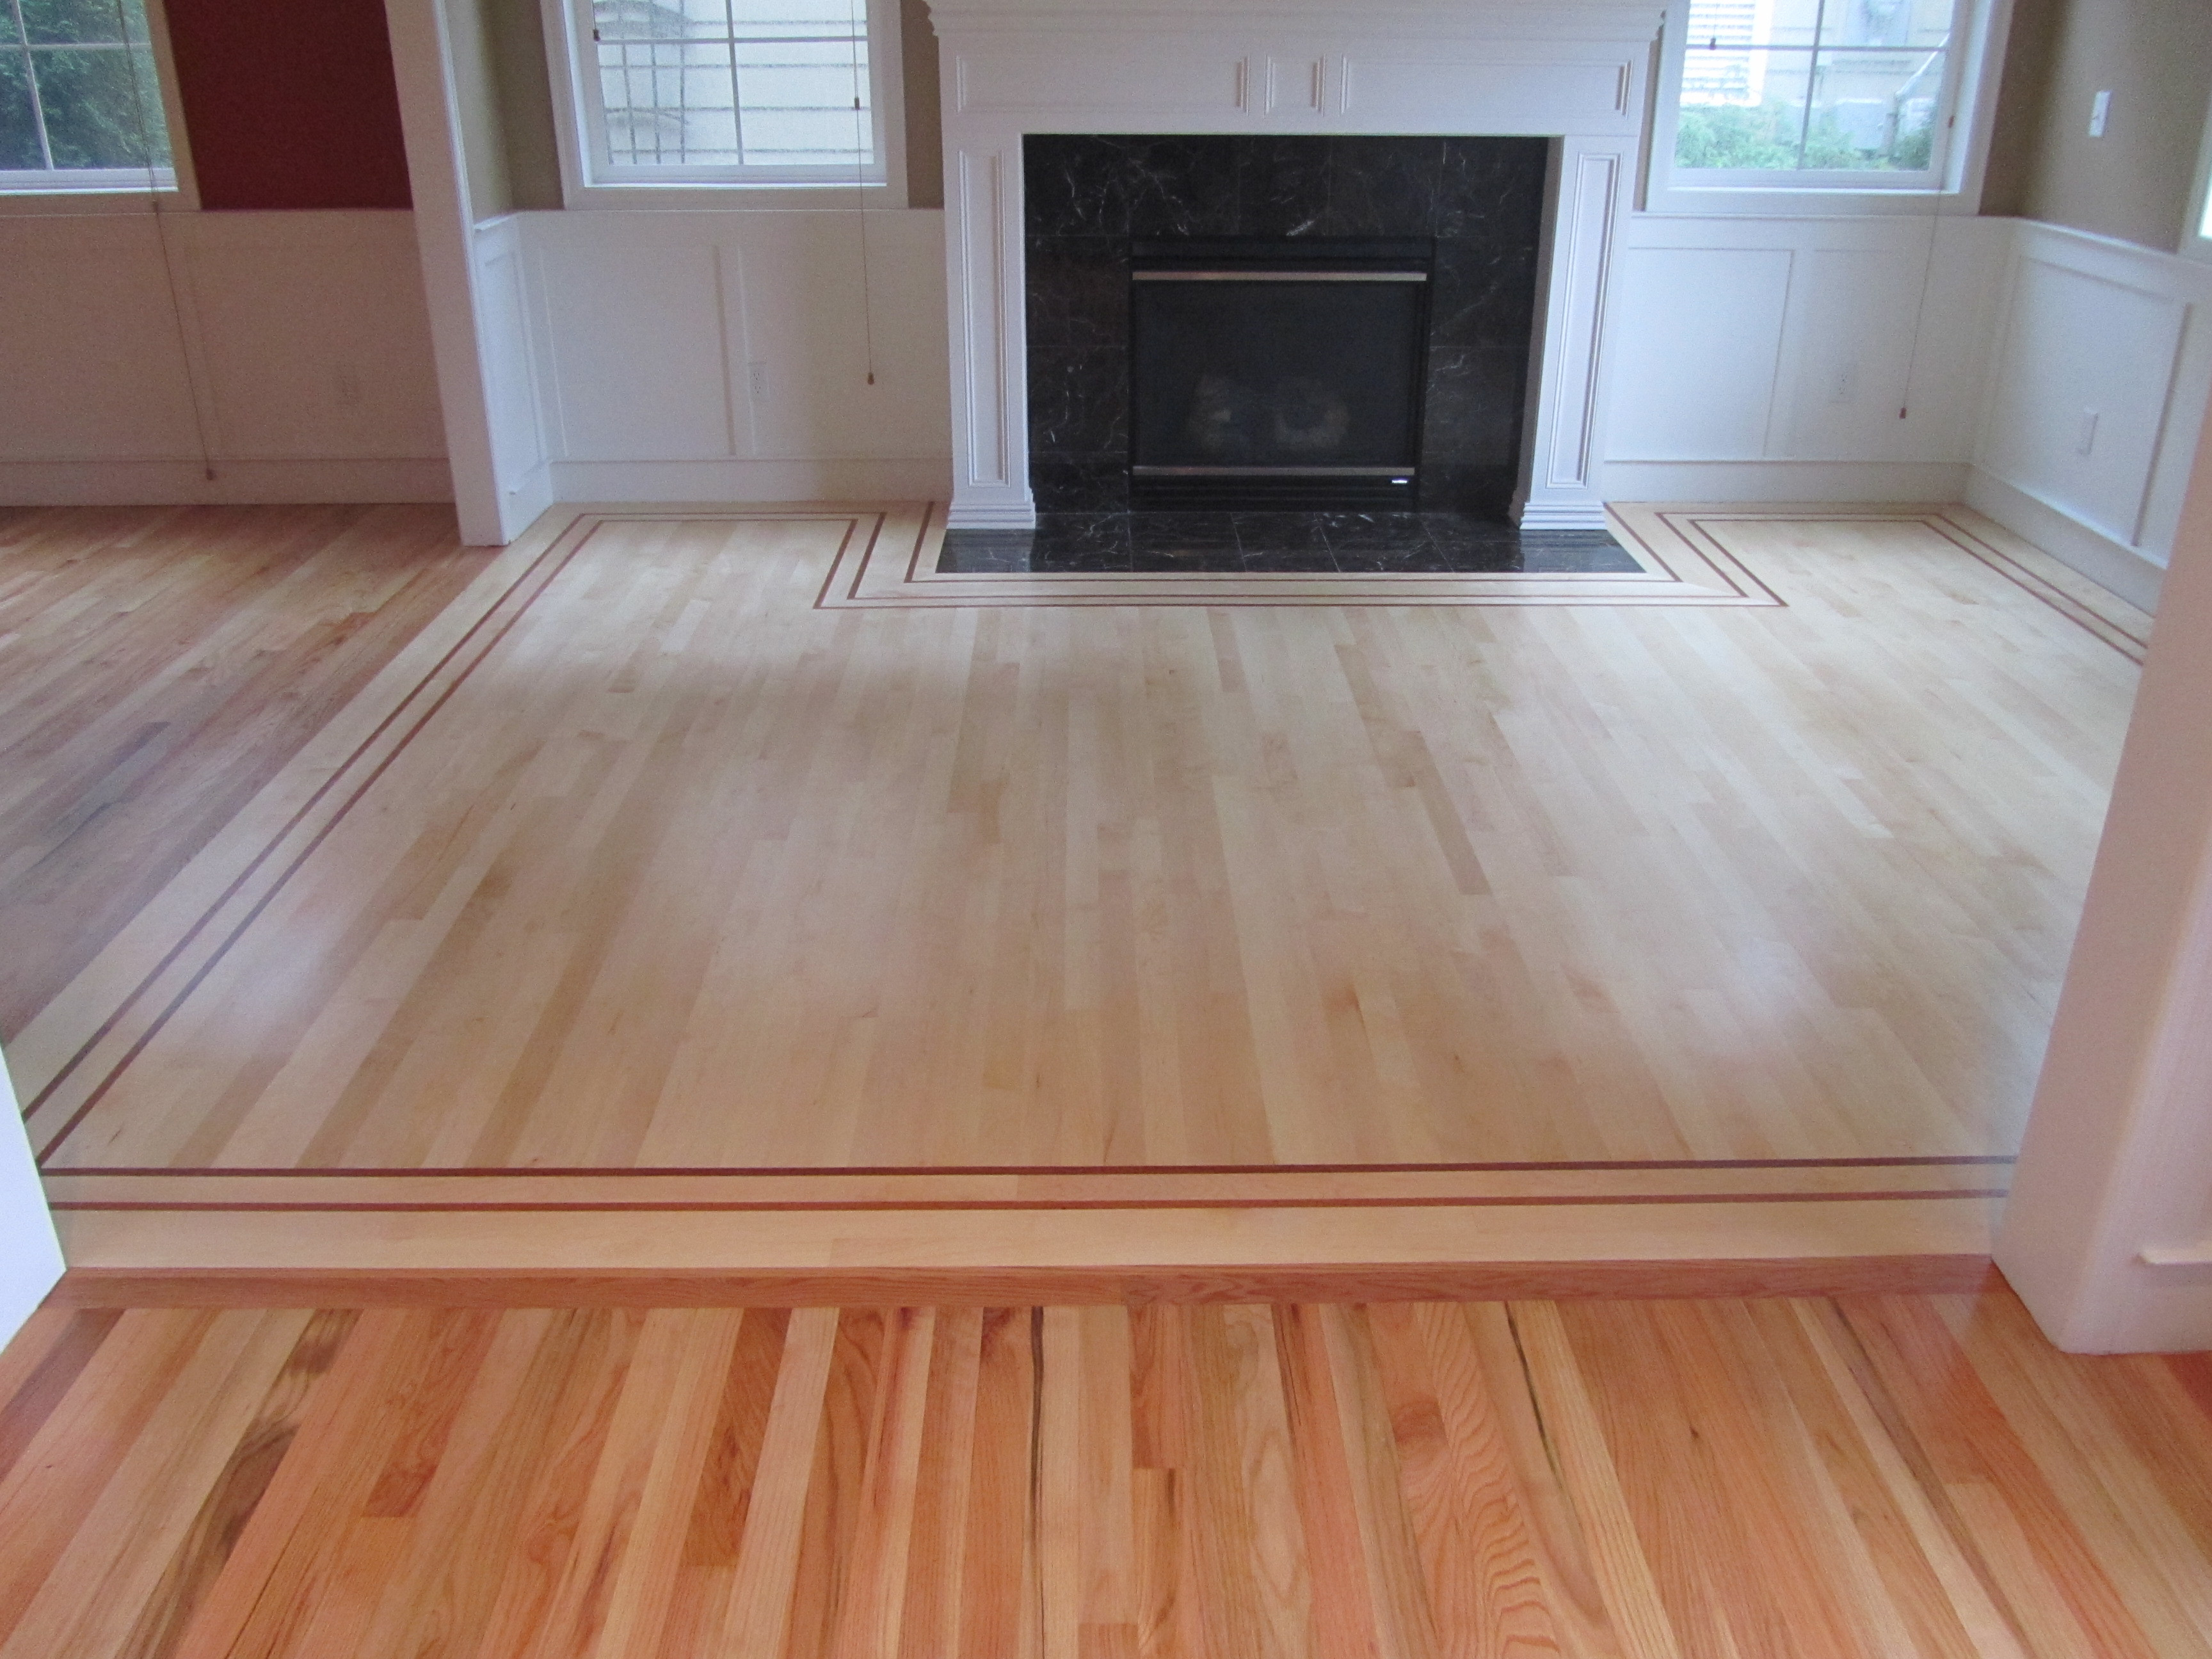 hardwood floor refinishing orlando fl of hardwood floor refinishing richmond va hardwood flooring for hardwood floor refinishing richmond va hardwood flooring contractor